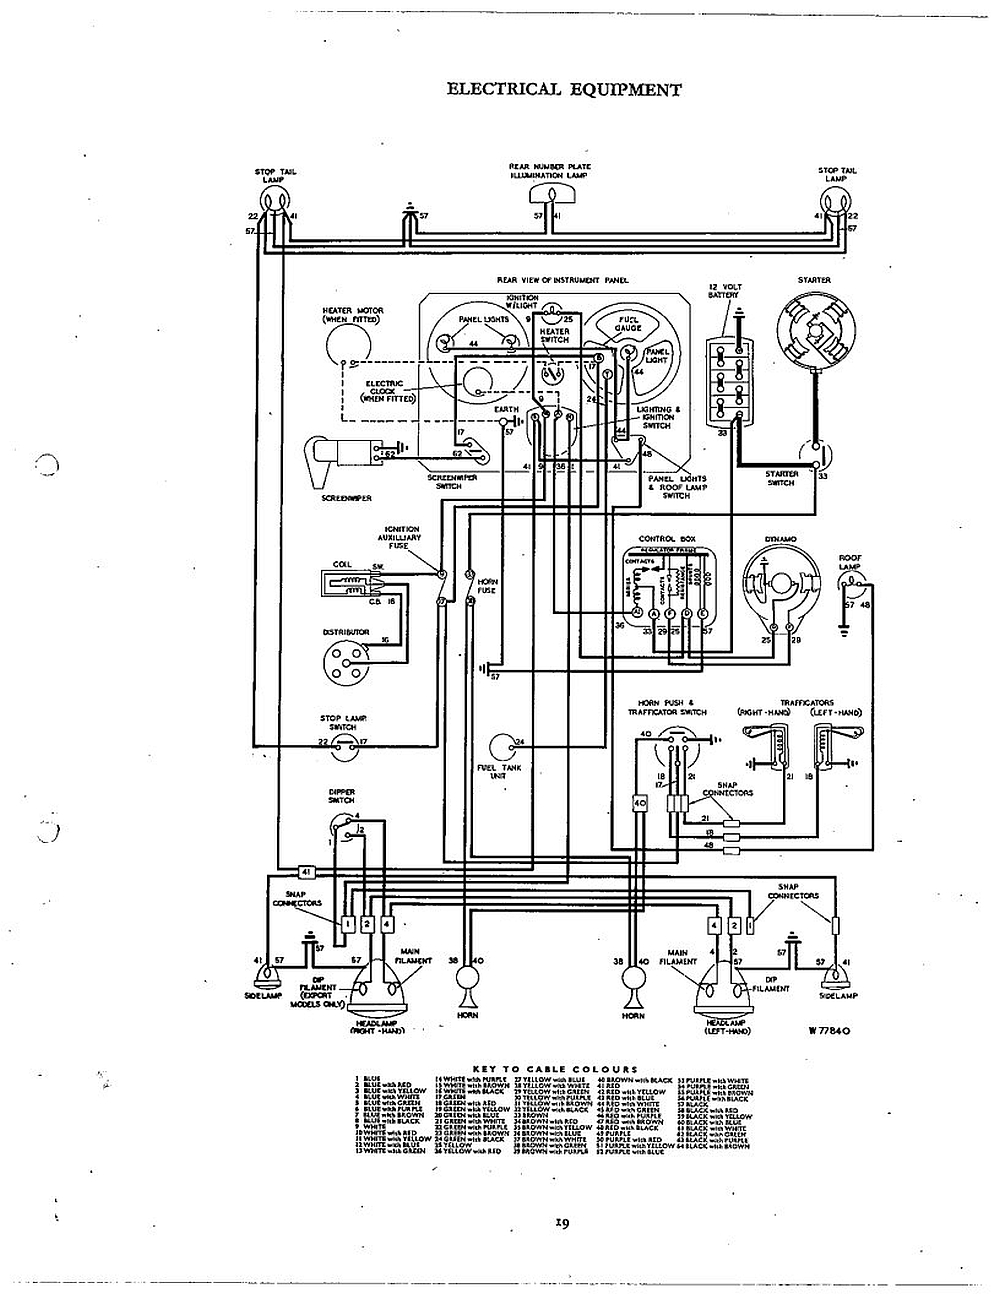 triumph wiring diagrams wiring diagram libraries triumph tr4a wiring diagram detailed wiring diagrami1 wp com vitessesteve co uk images wiringdiagrams mg td